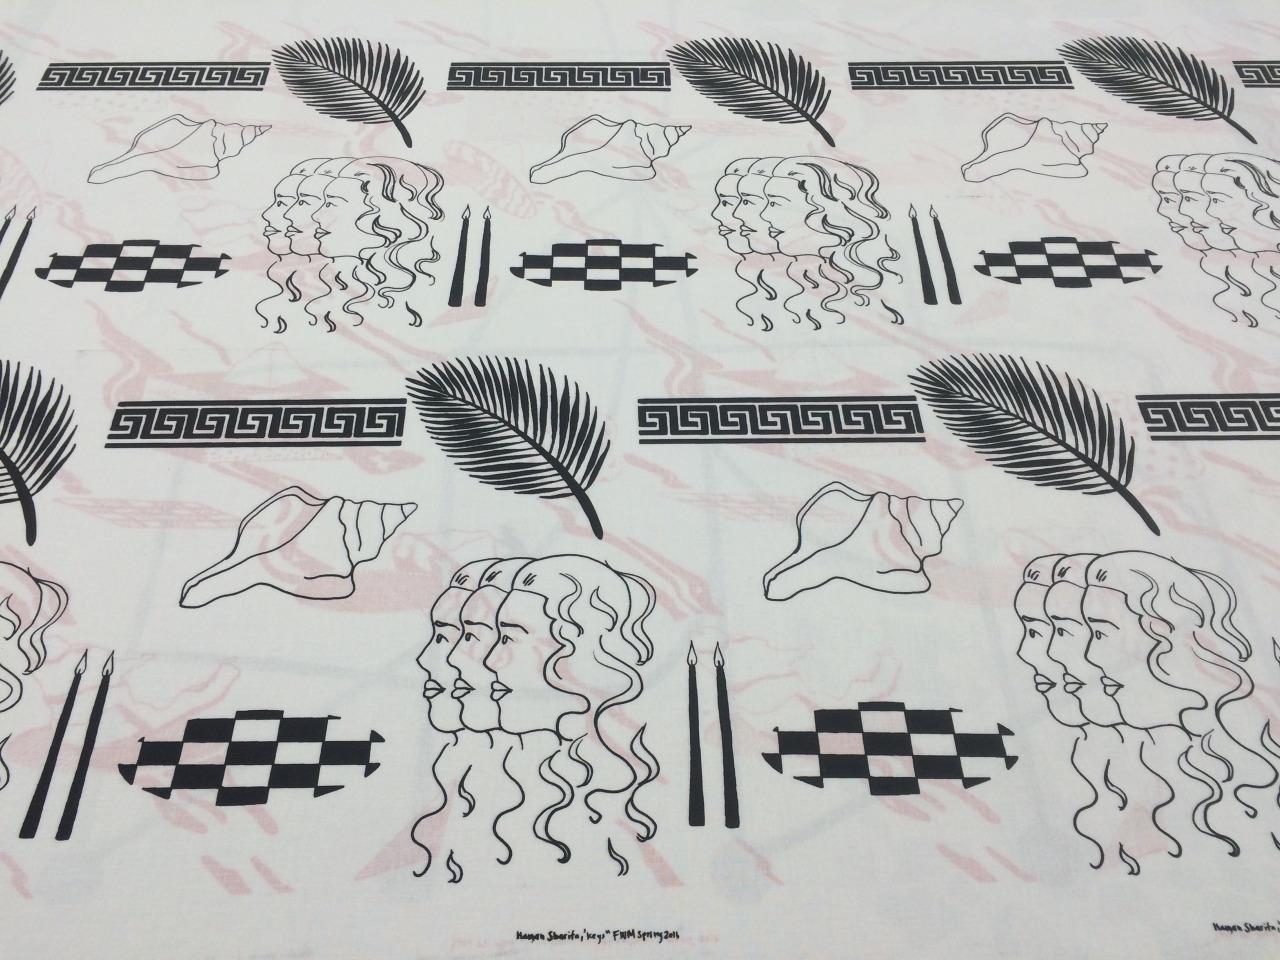 Hanan Sharifa, one colour repeat pattern, screen print on fabric, 30 x 72.